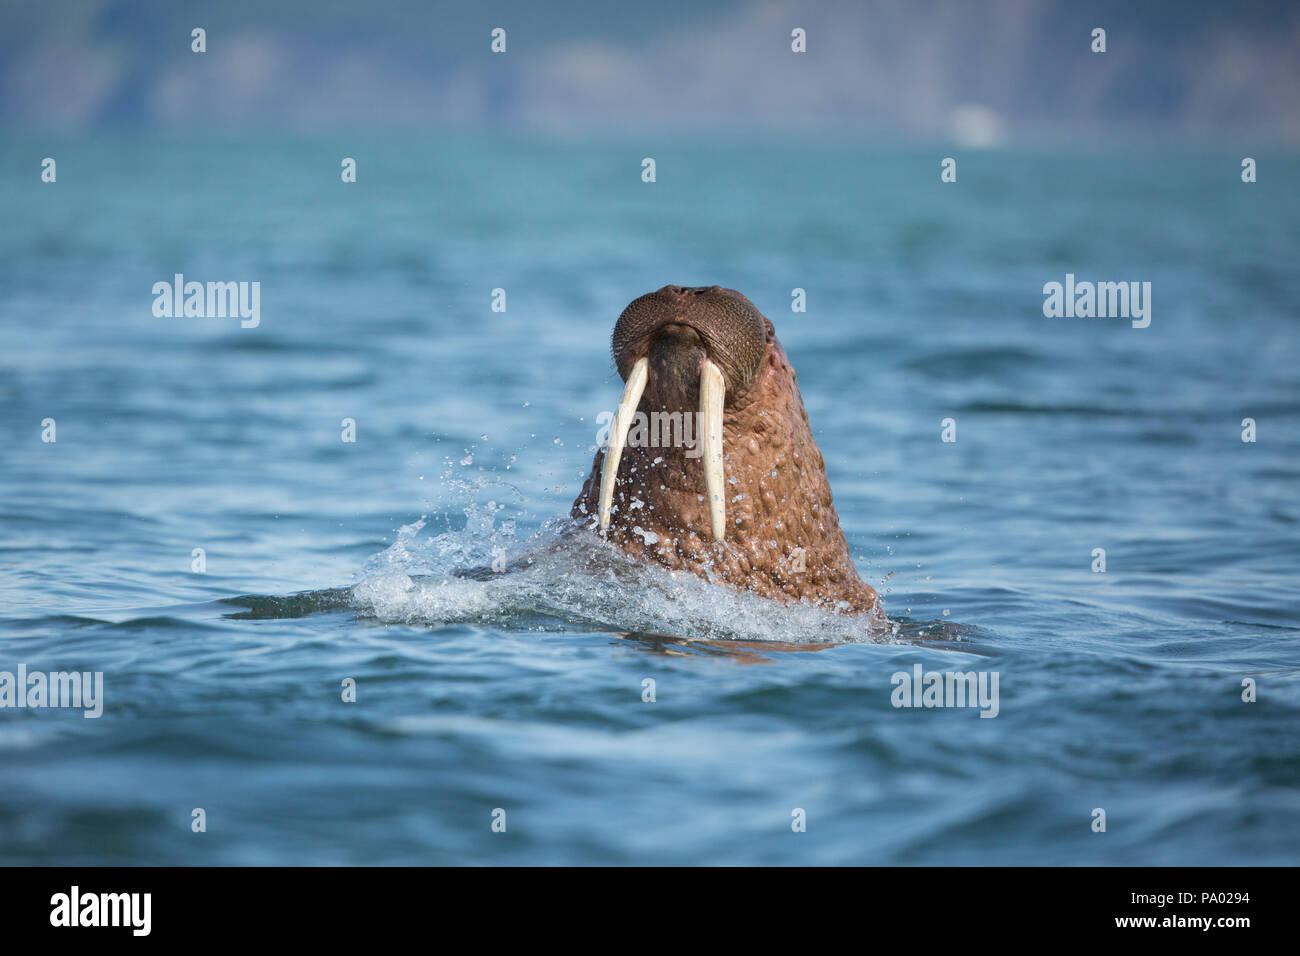 La morsa del Pacífico (Odobenus rosmarus divergens), Kamchatka, Rusia Imagen De Stock